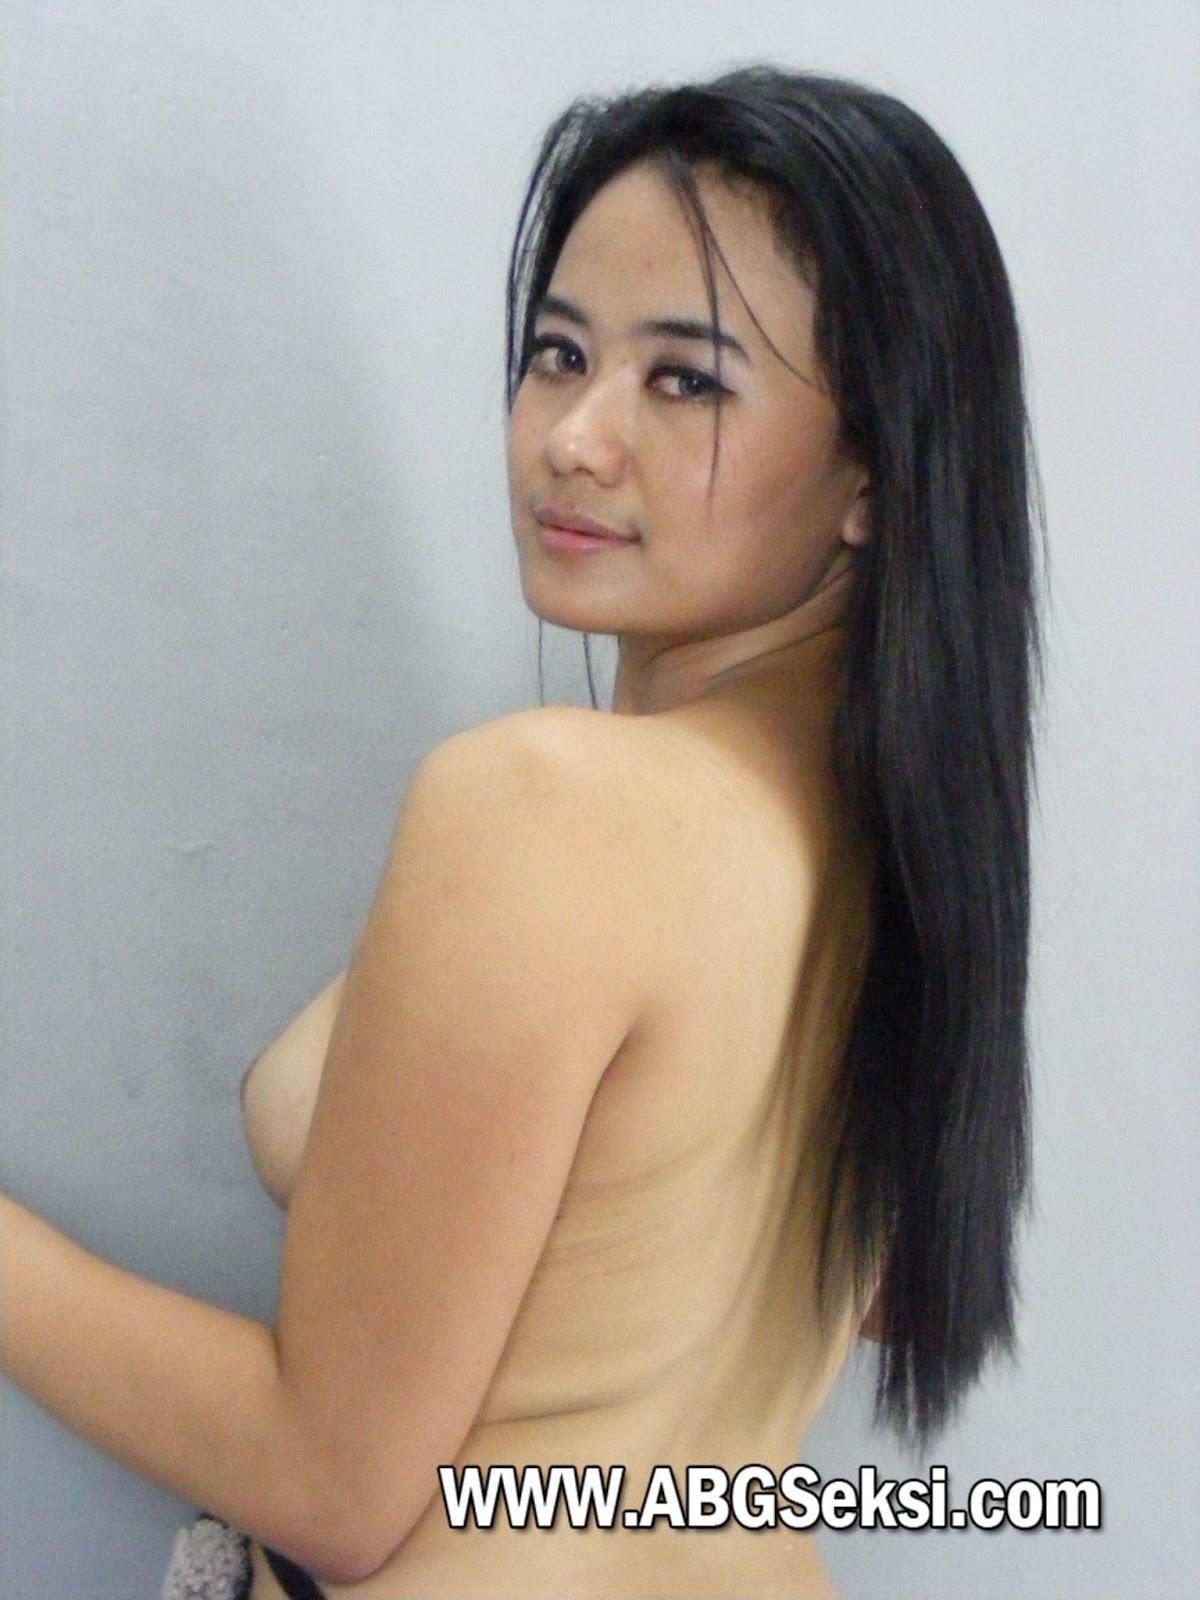 Hot Telanjang Bugil Blog Gadis Indonesia Telanjang